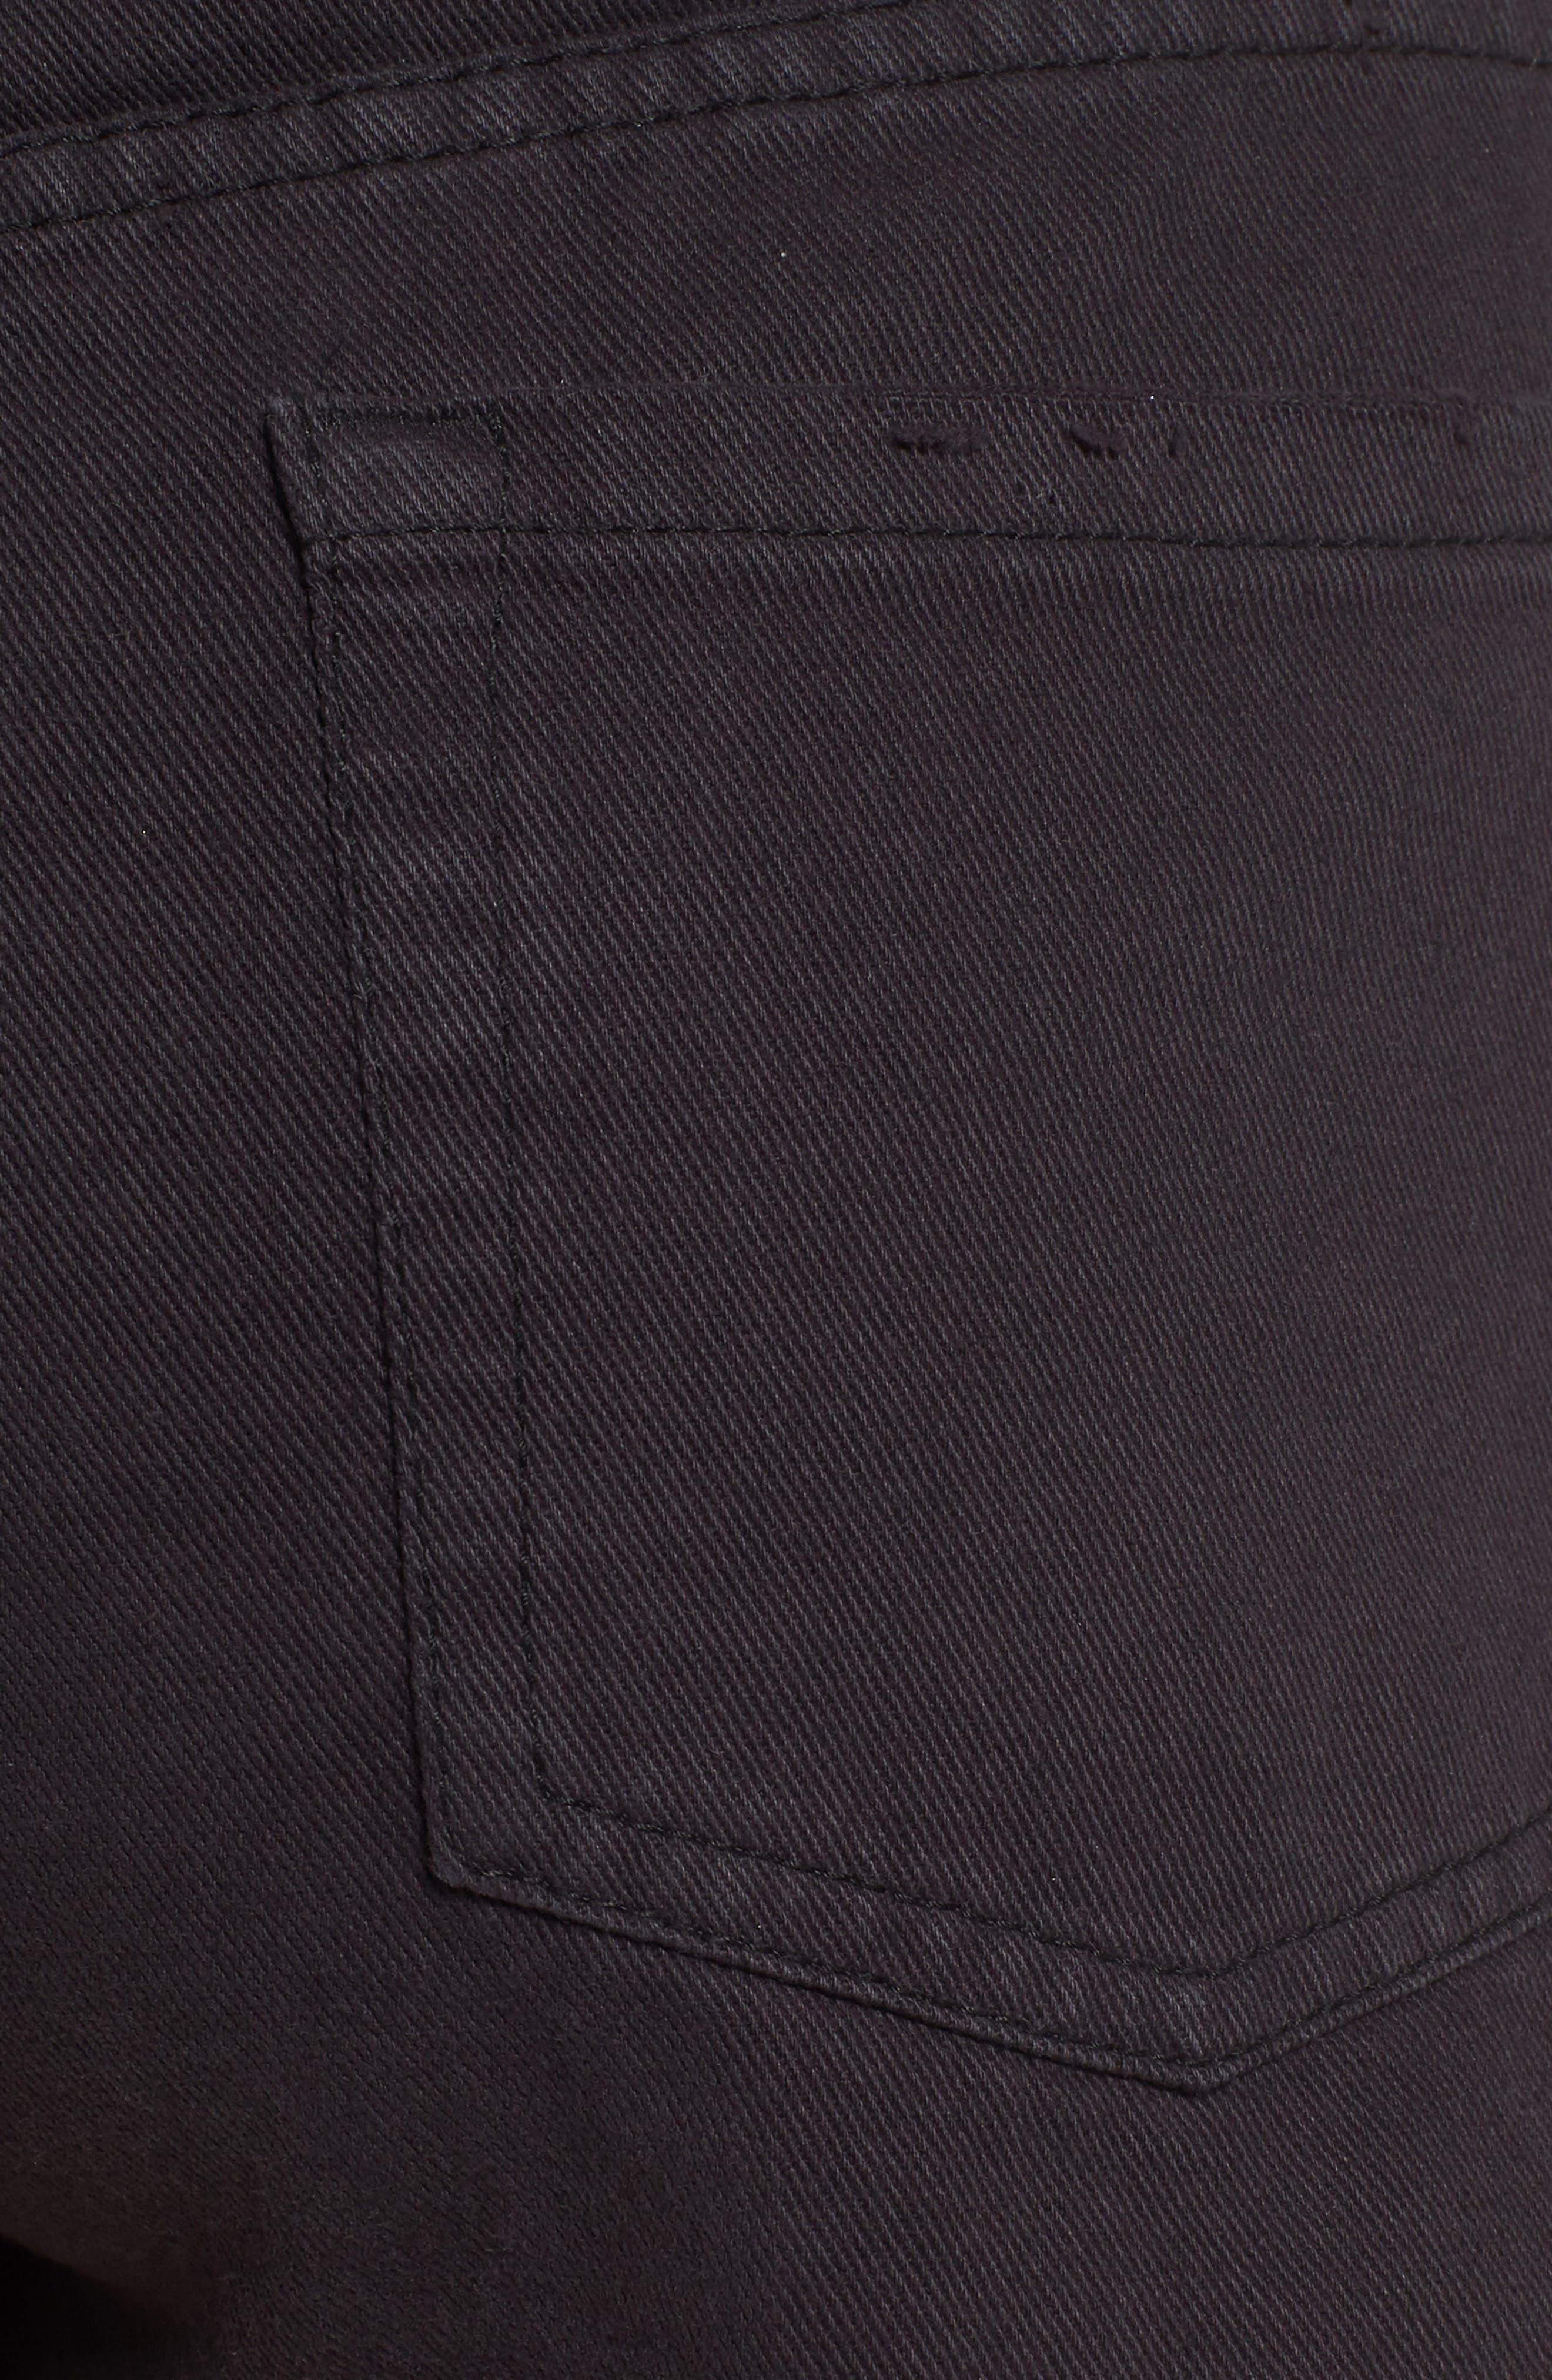 Shoreline Fray Hem Denim Shorts,                             Alternate thumbnail 3, color,                             Black